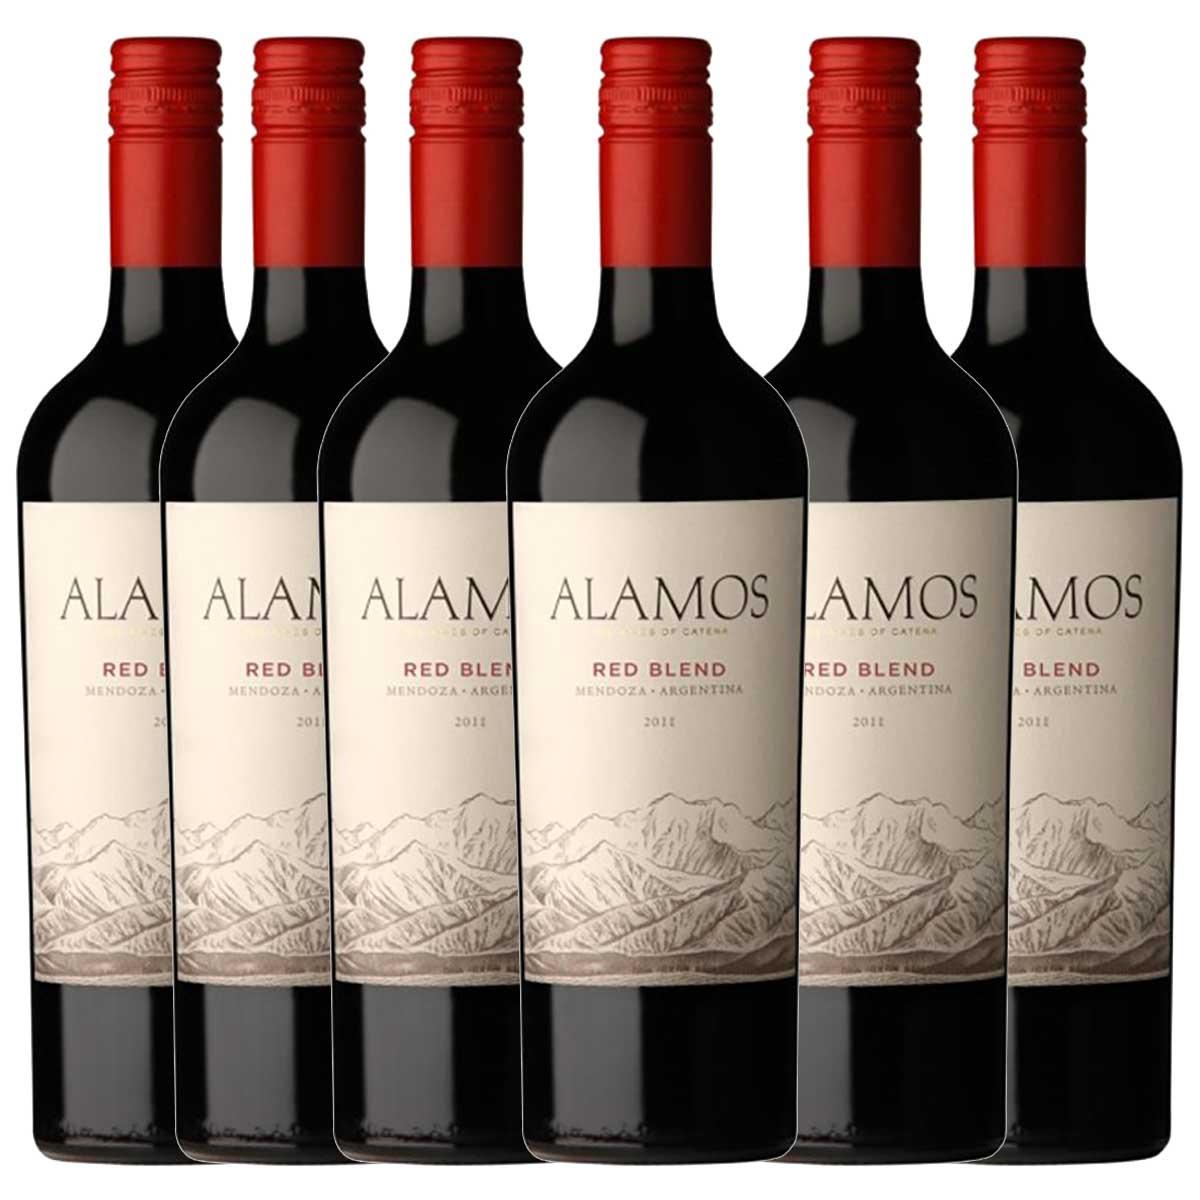 Kit 6x Vinho Argentino Tinto Alamos Blend 2018 Catena Wines